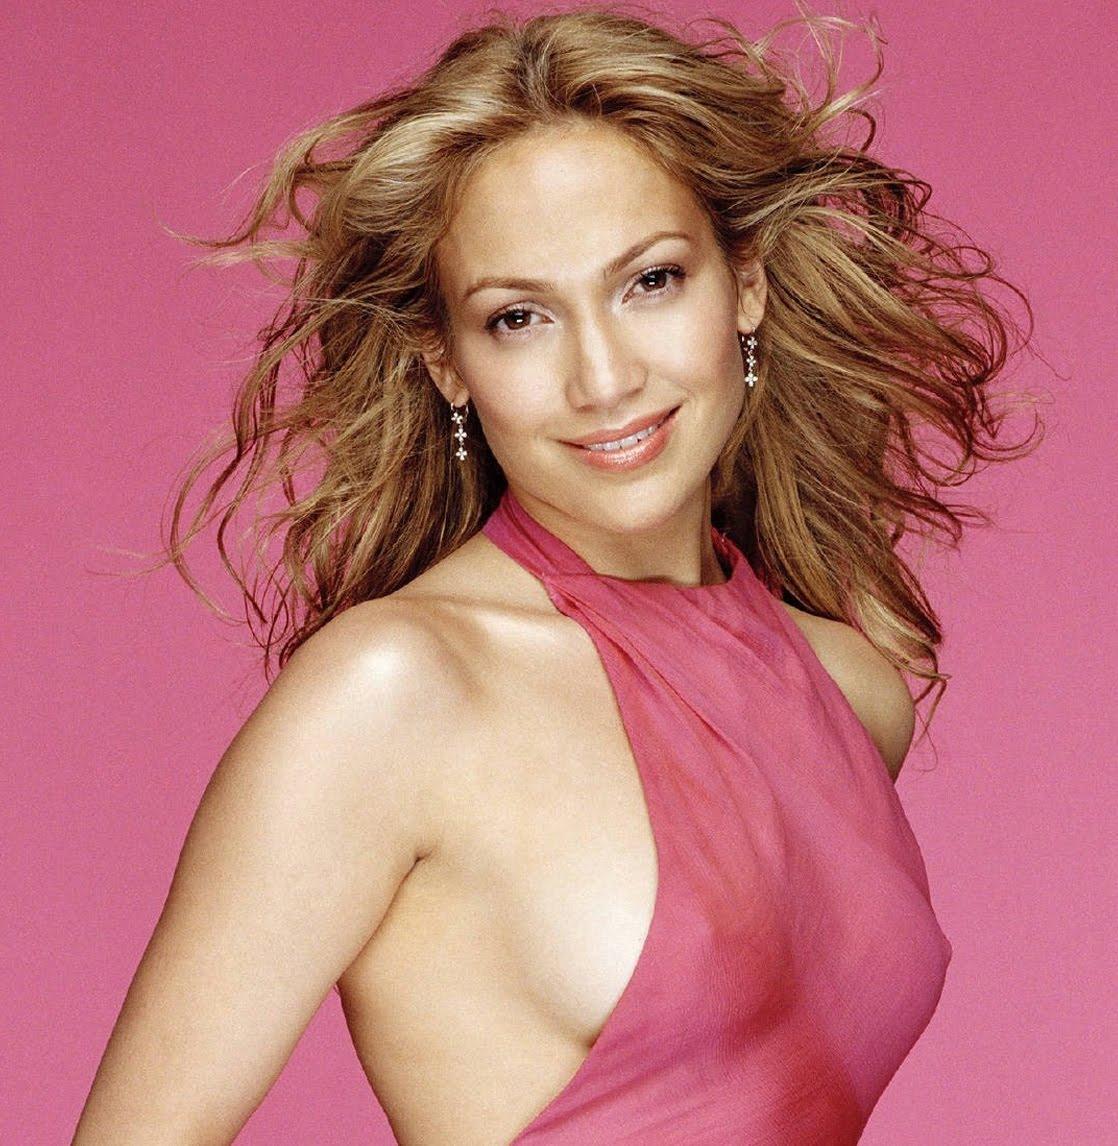 http://1.bp.blogspot.com/-Ly91XPmm85w/TeisRm6YWfI/AAAAAAAAaEA/D6Yjmdqcrjc/s1600/Jennifer-Lopez_25.jpg